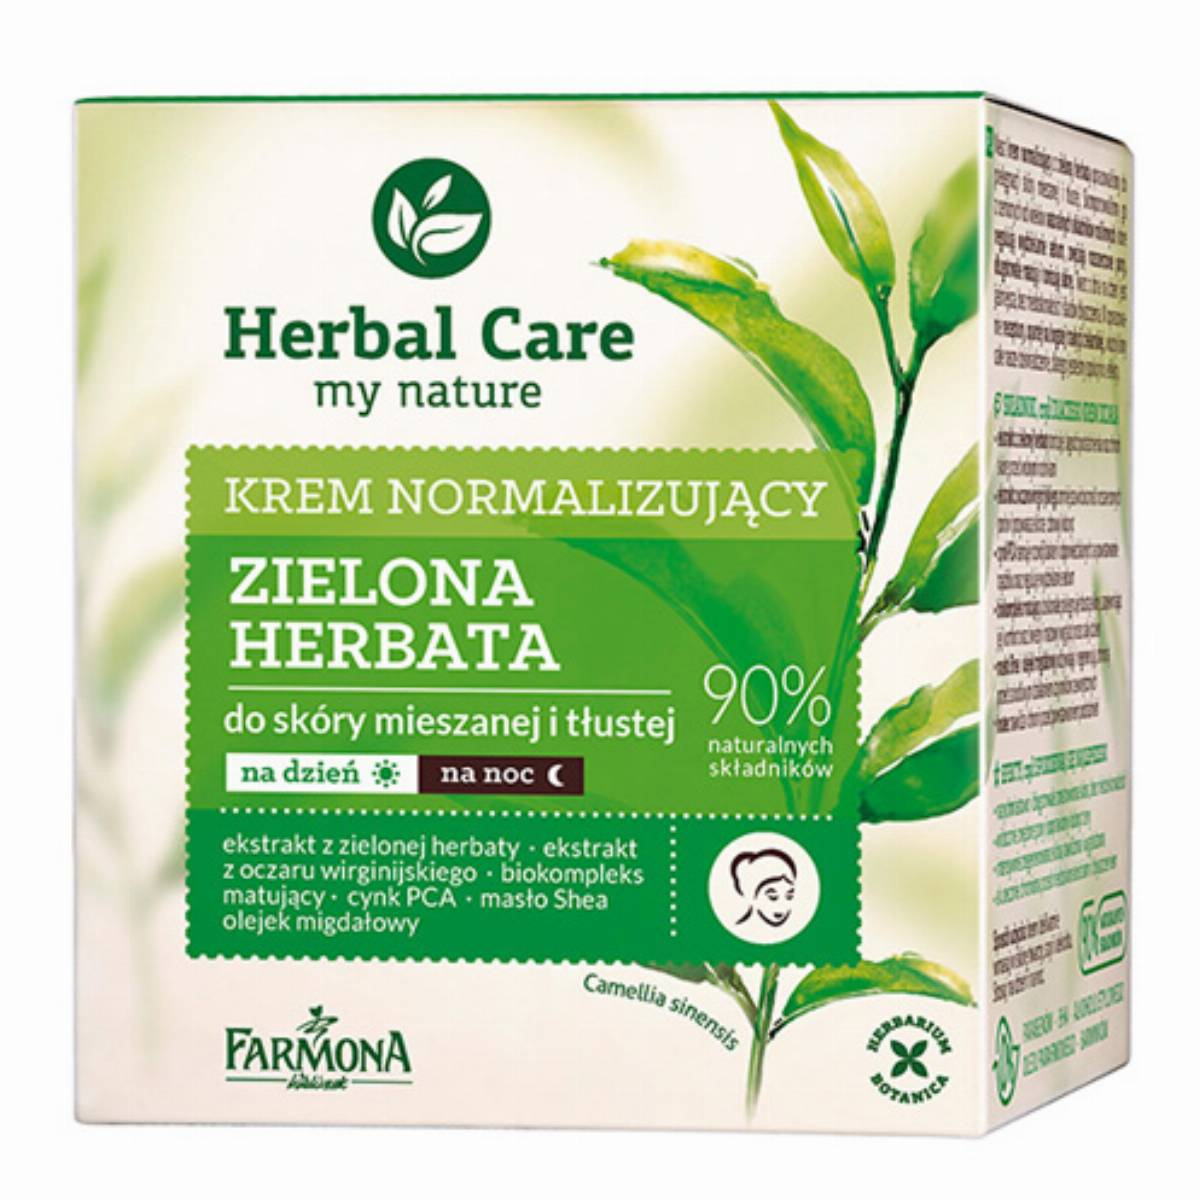 Farmona Herbal Care krem do twarzy - zielona herbata box